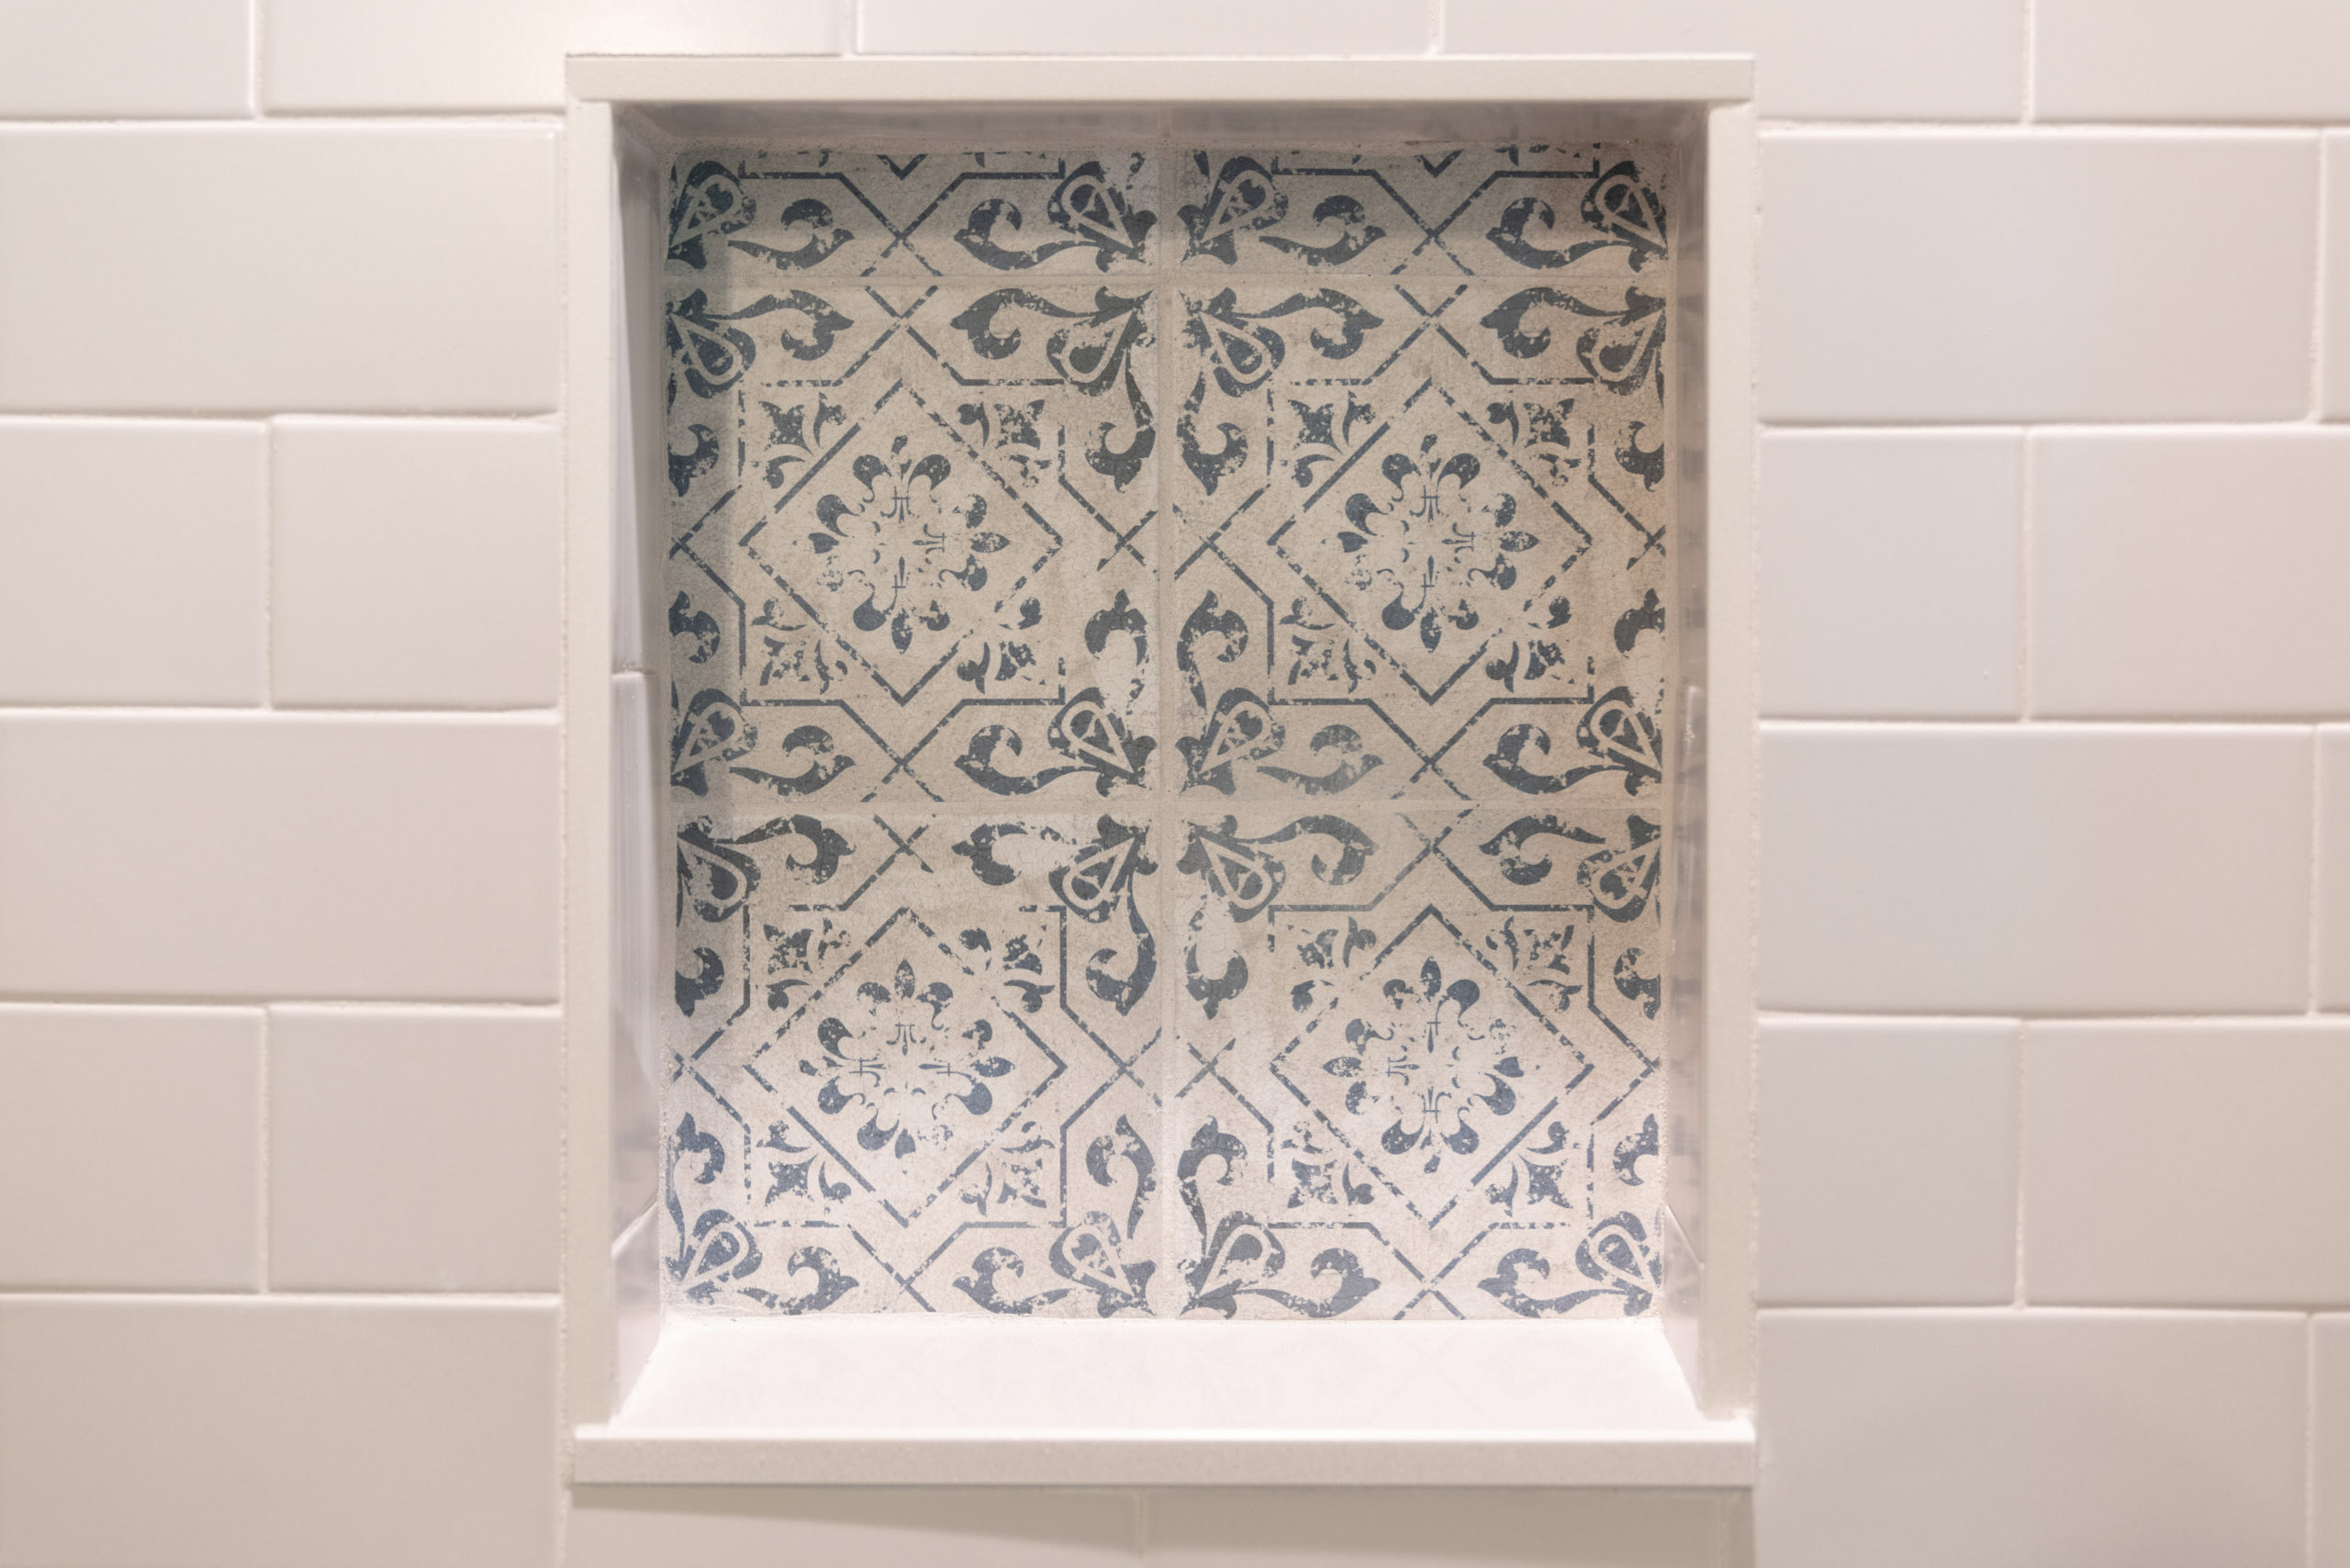 custom shower shelf with blue and white tile design